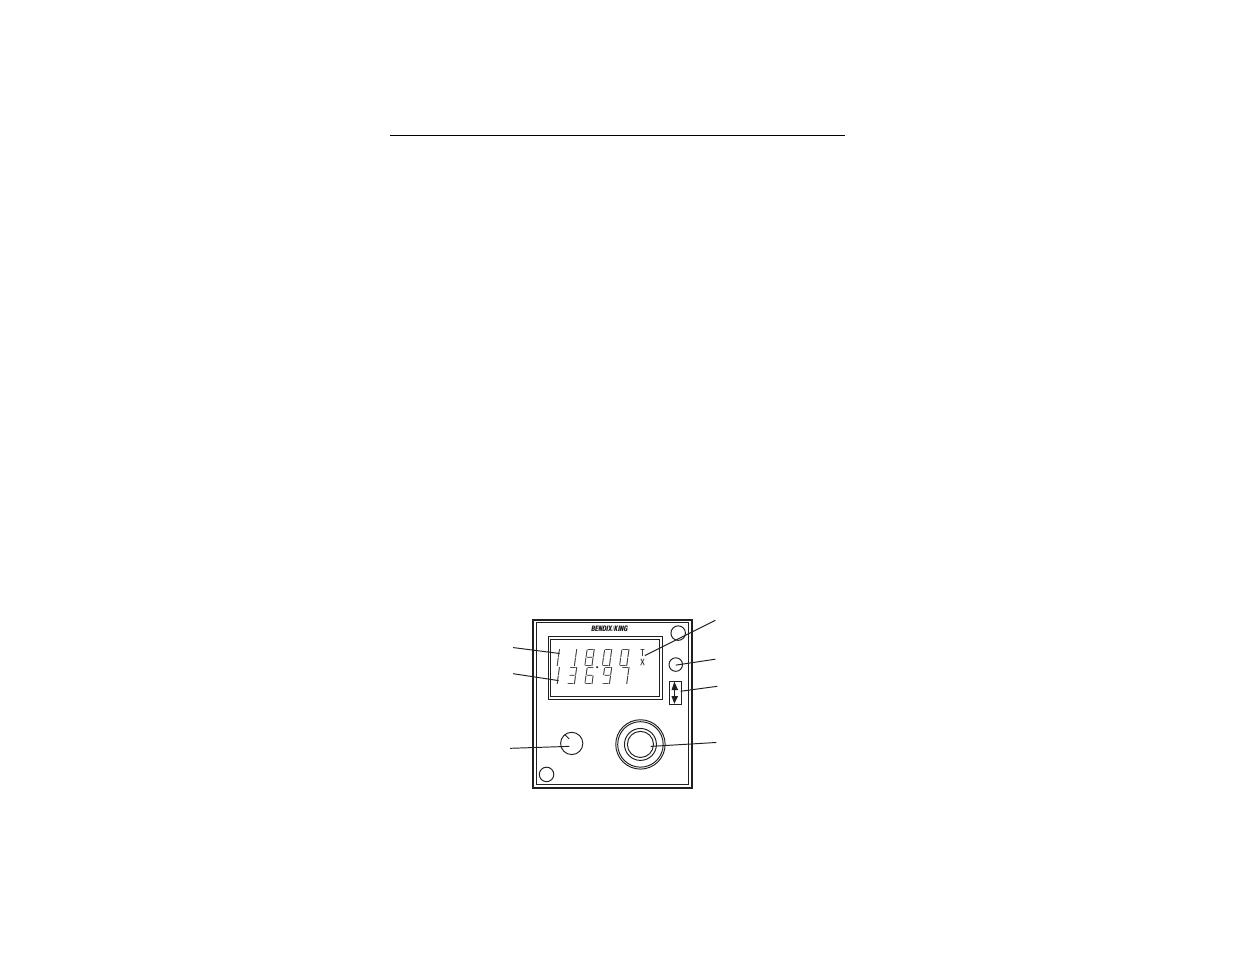 Vhf comm, Kfs 598 operating procedures, Kfs 598